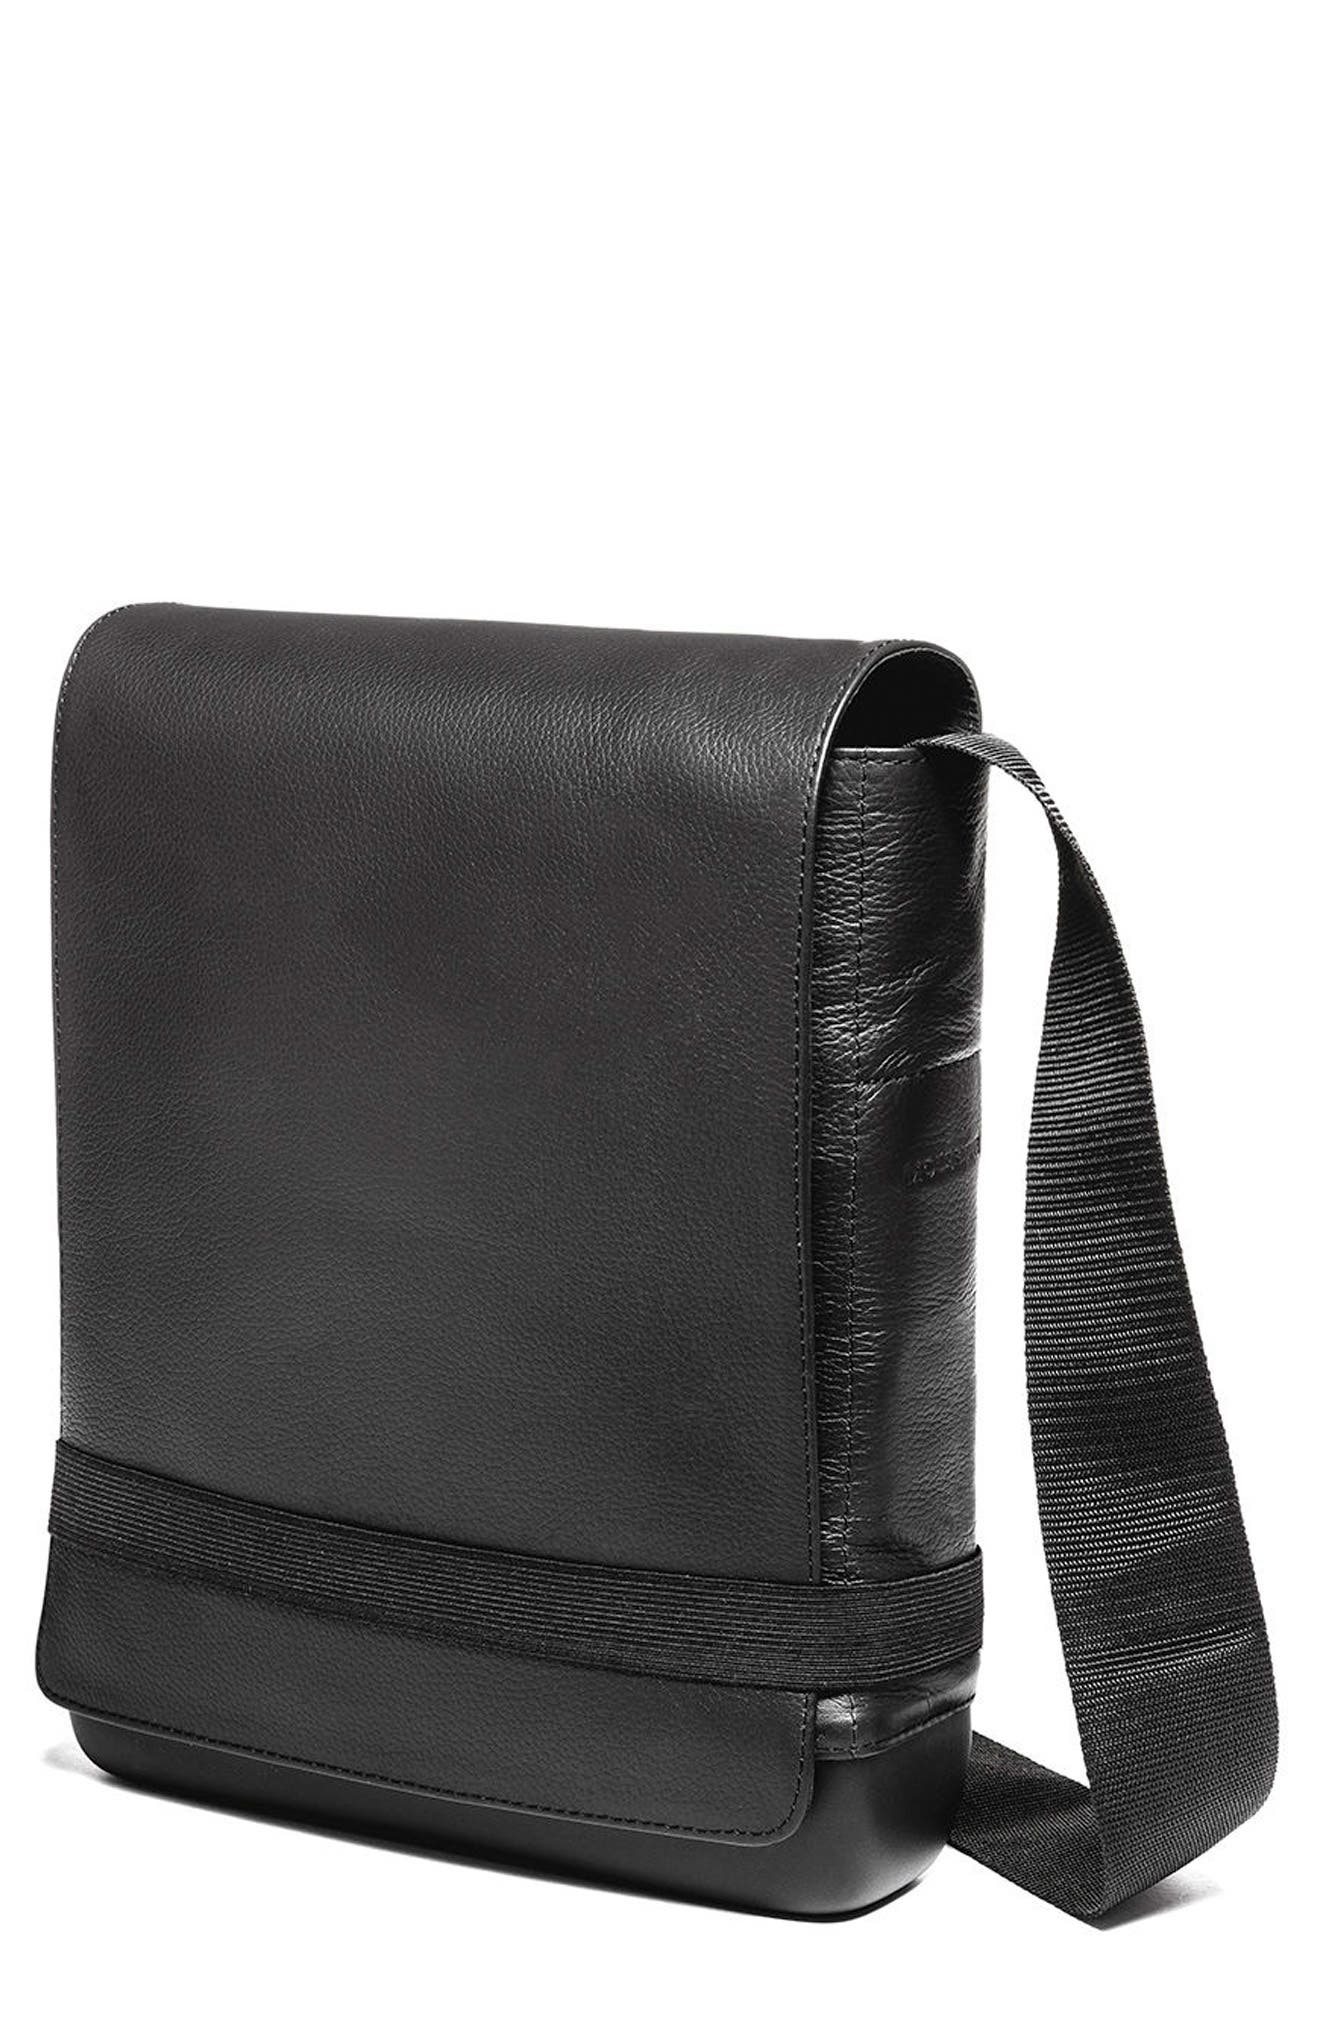 MOLESKINE Leather Reporter Bag, Main, color, 001